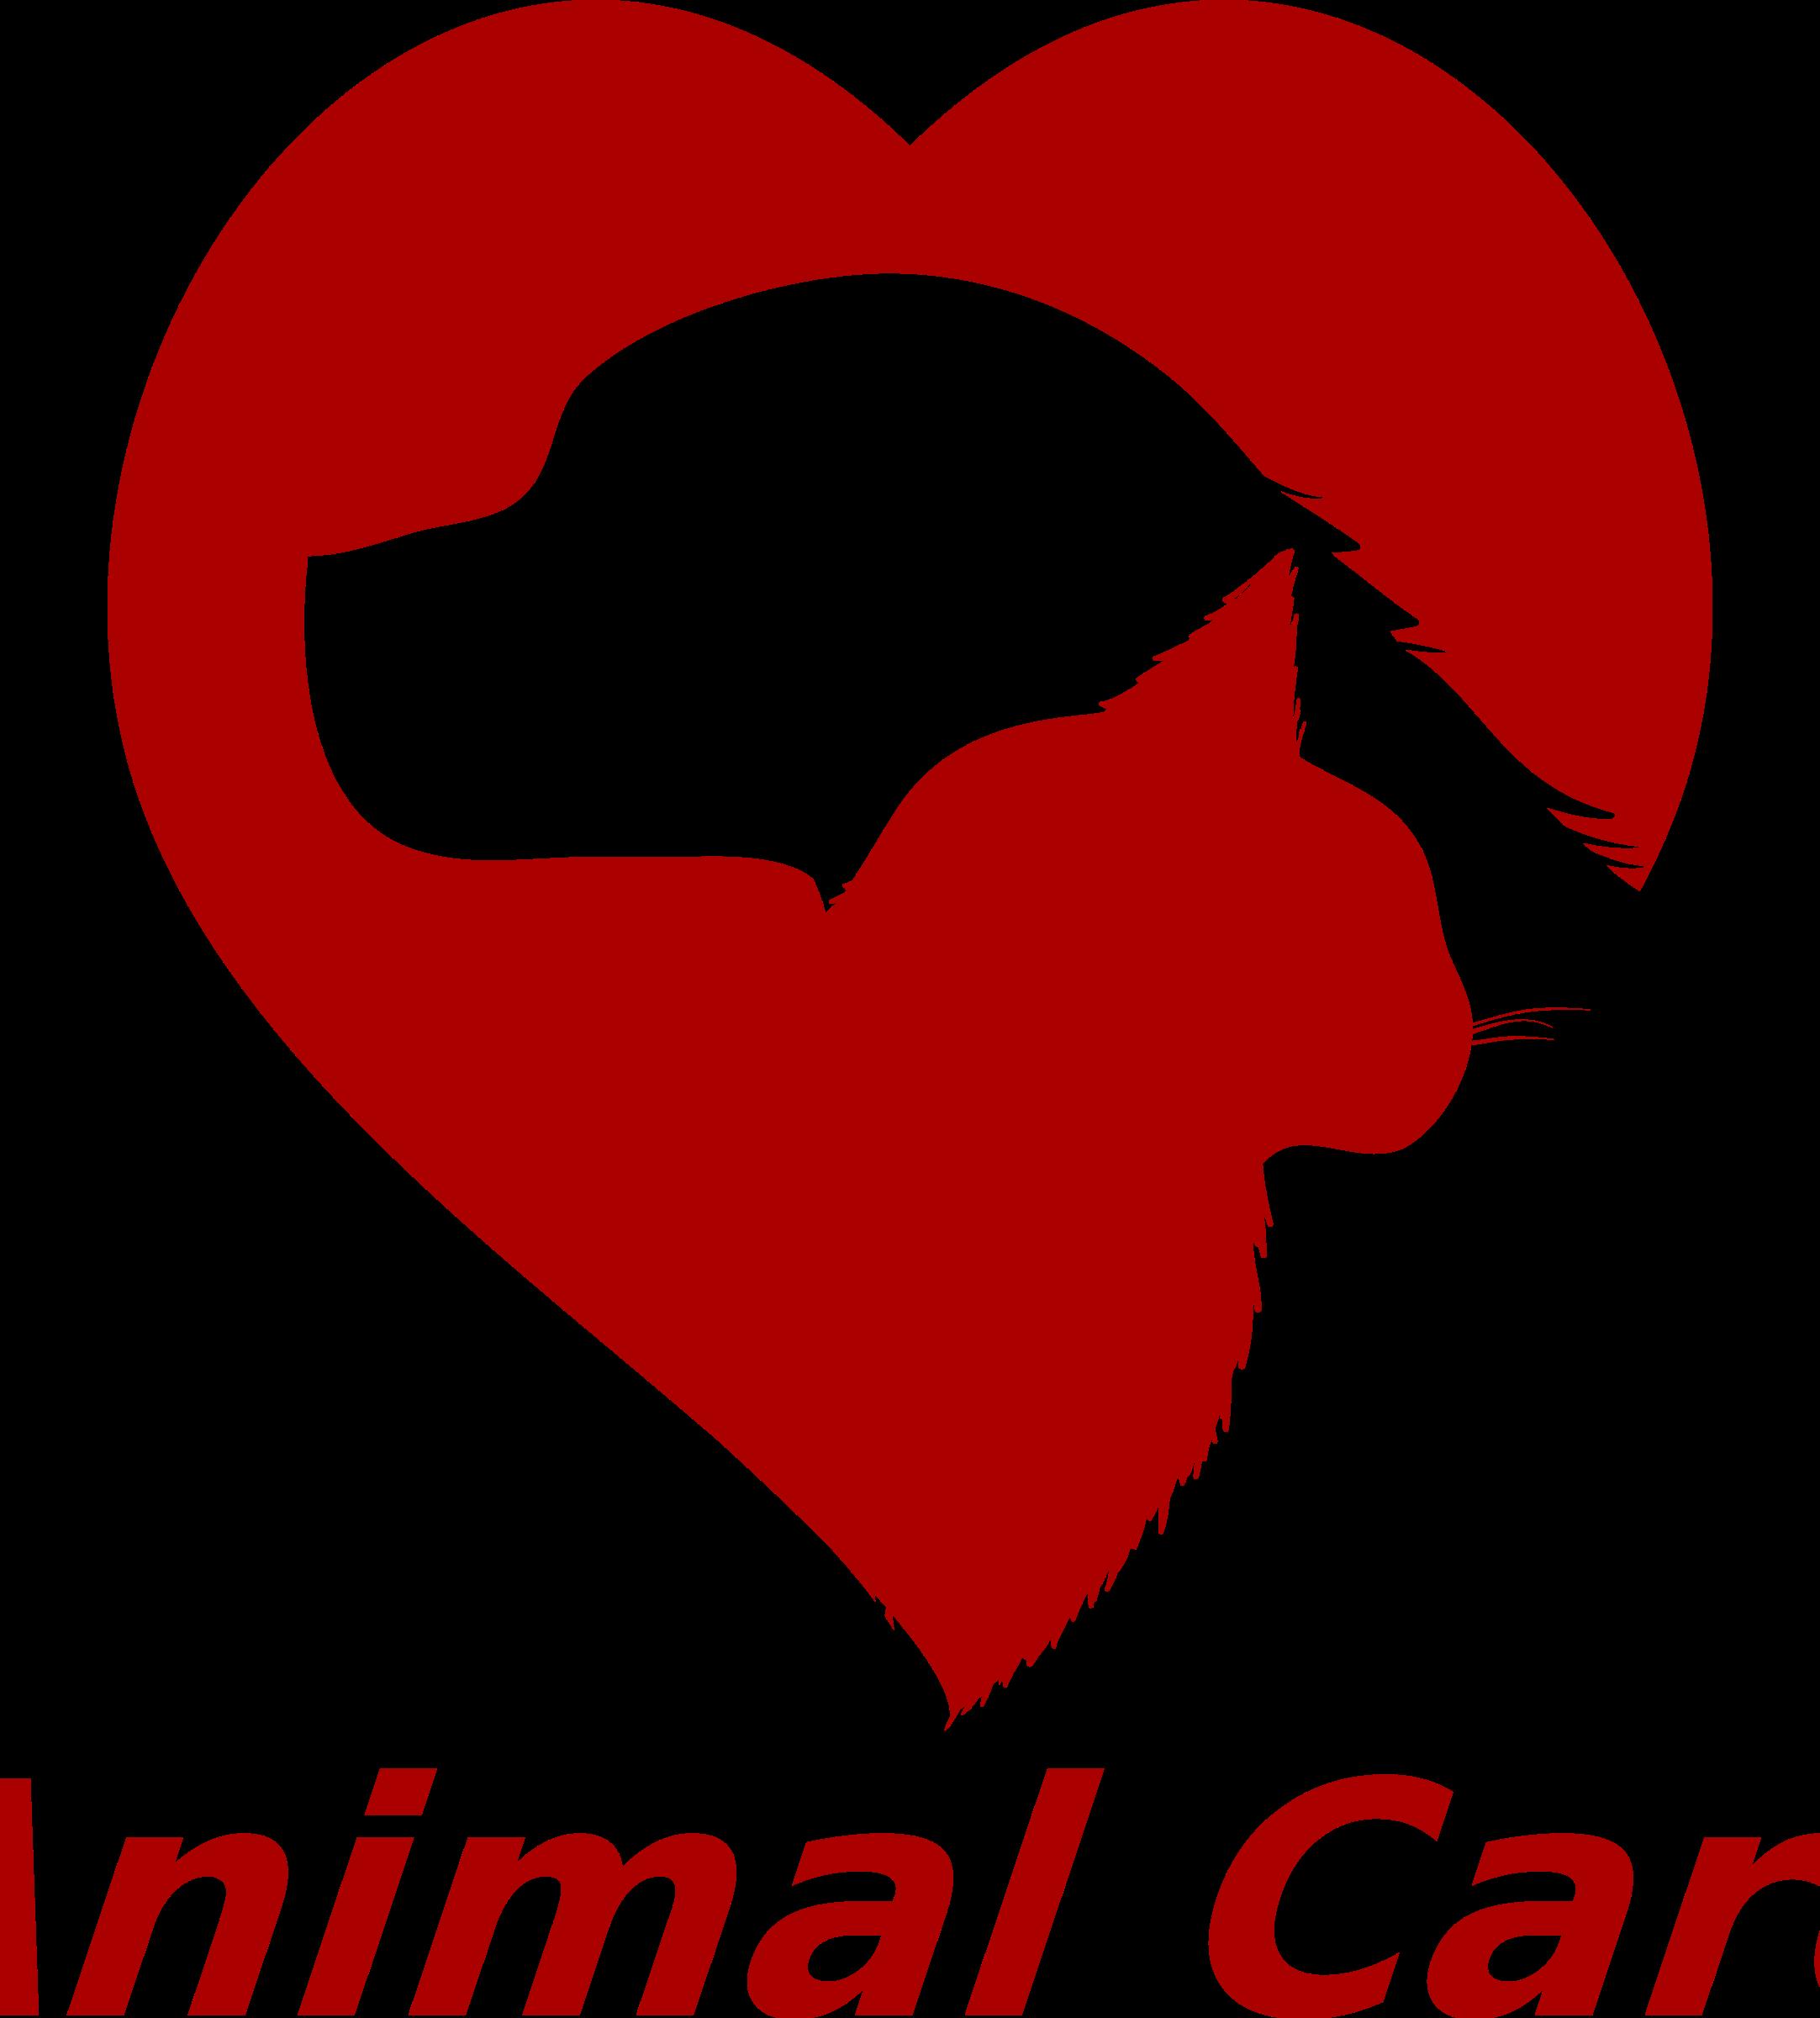 Pet clipart logo. Animal care big image